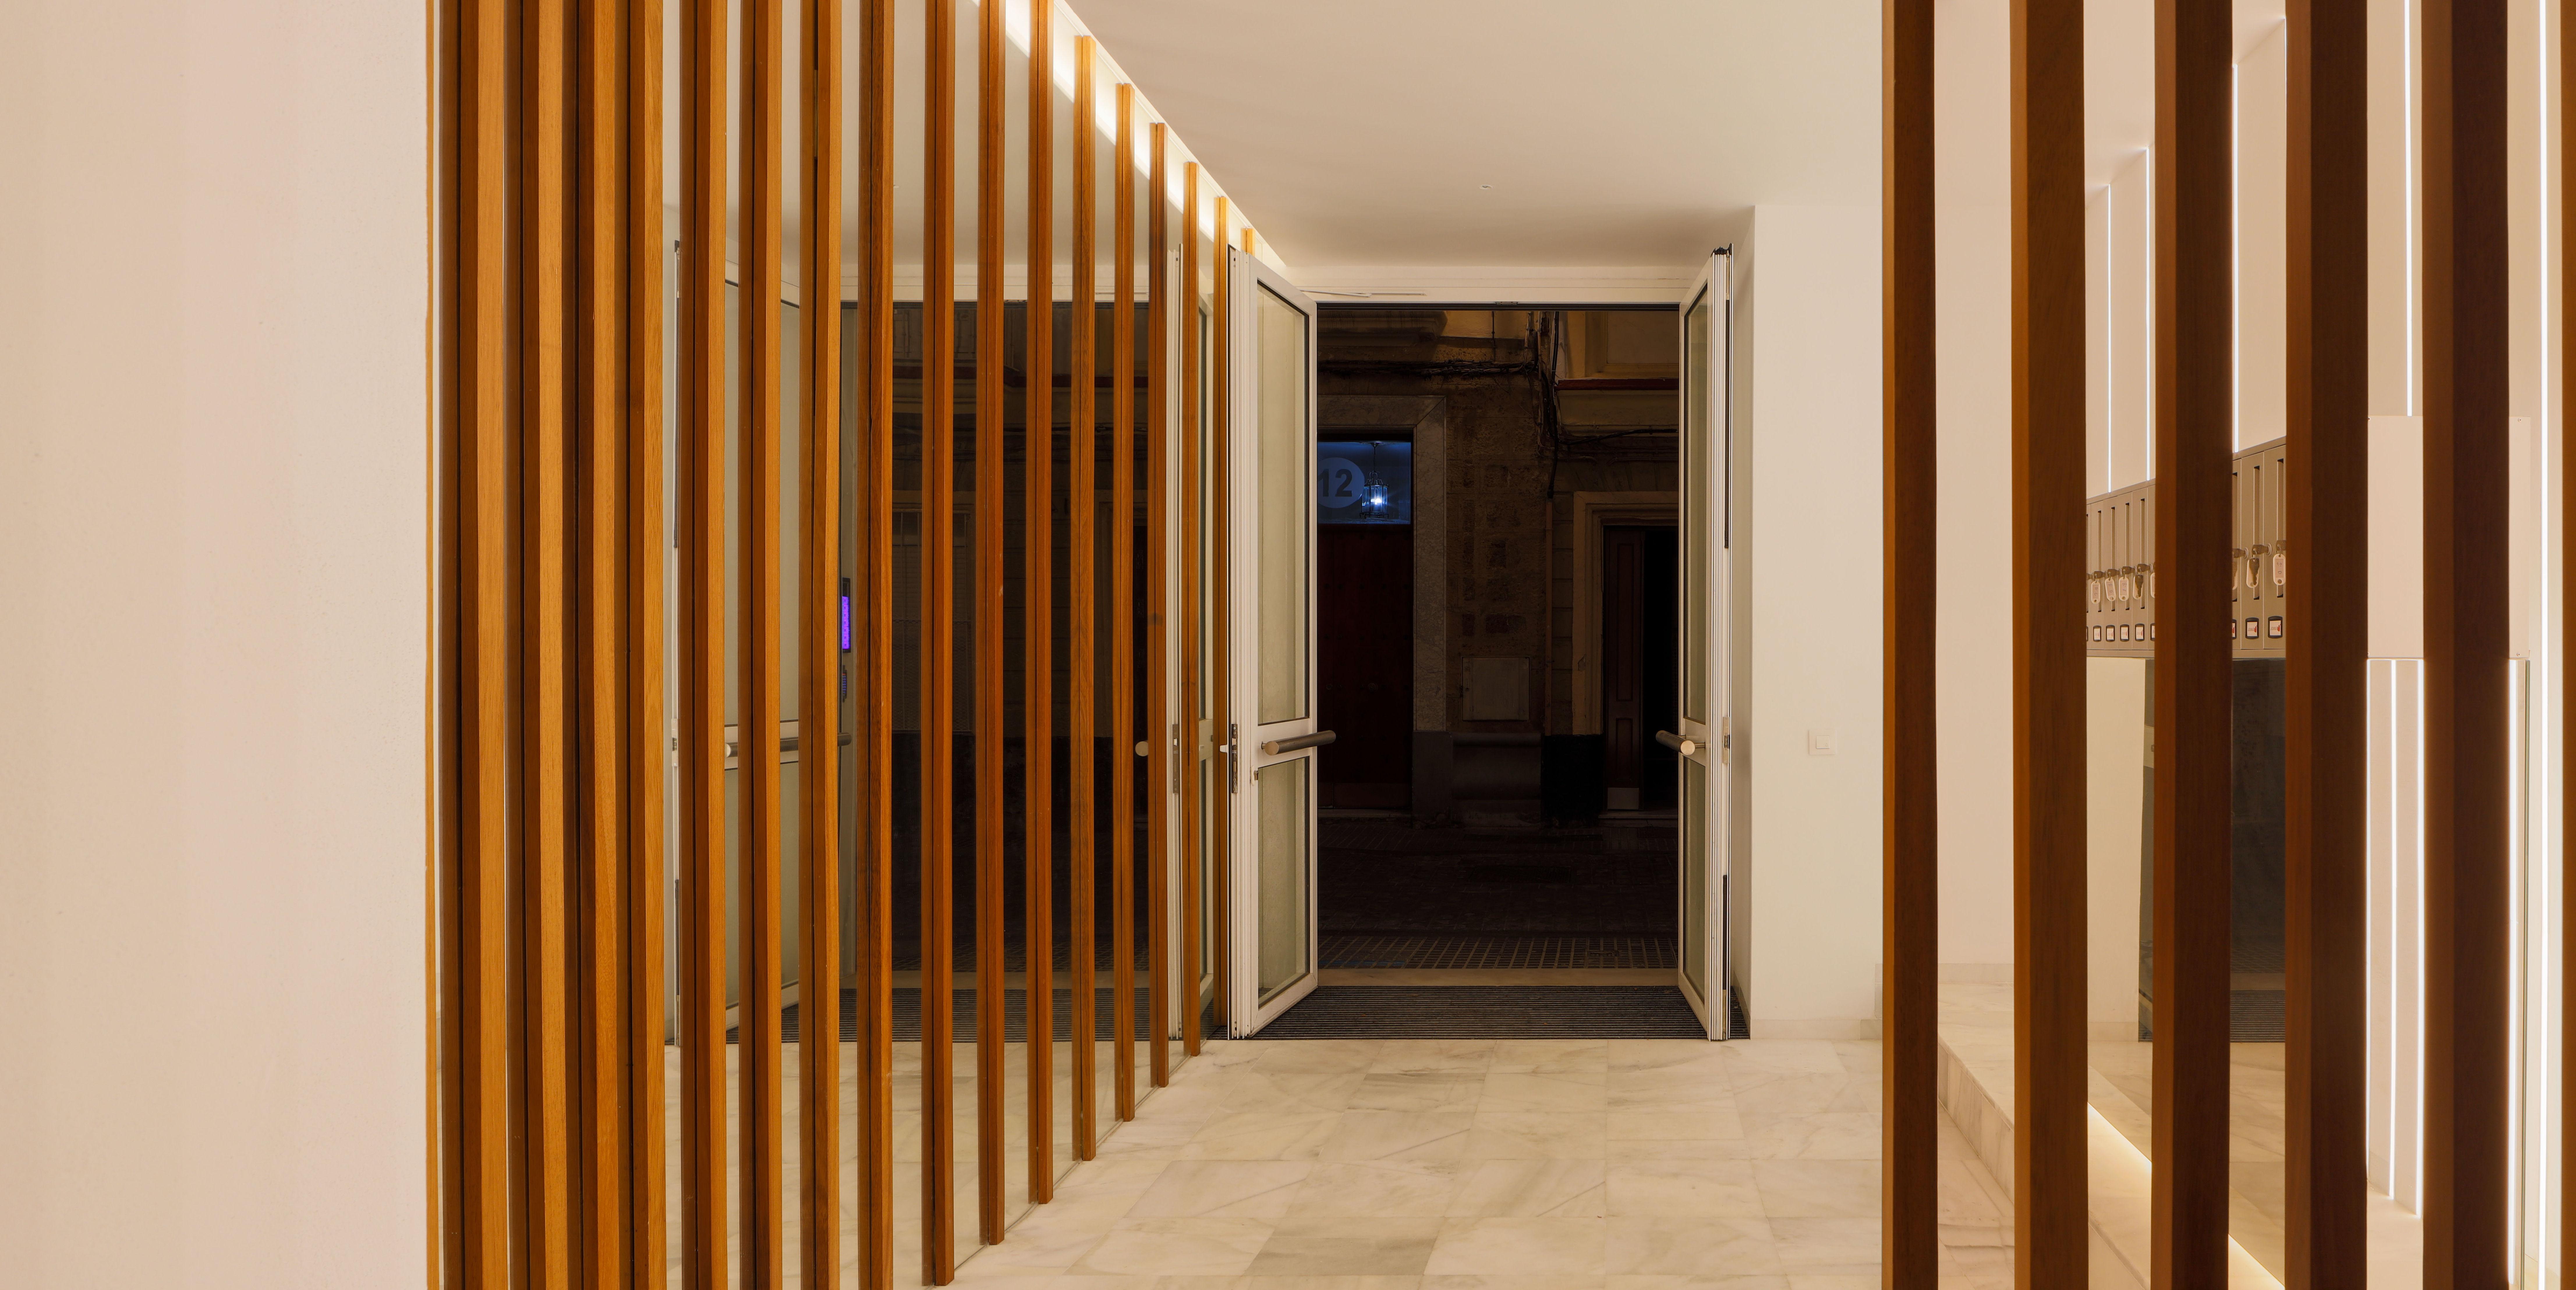 Foto 45 de Arquitectura en Cádiz | VILCHES ARQUITECTOS